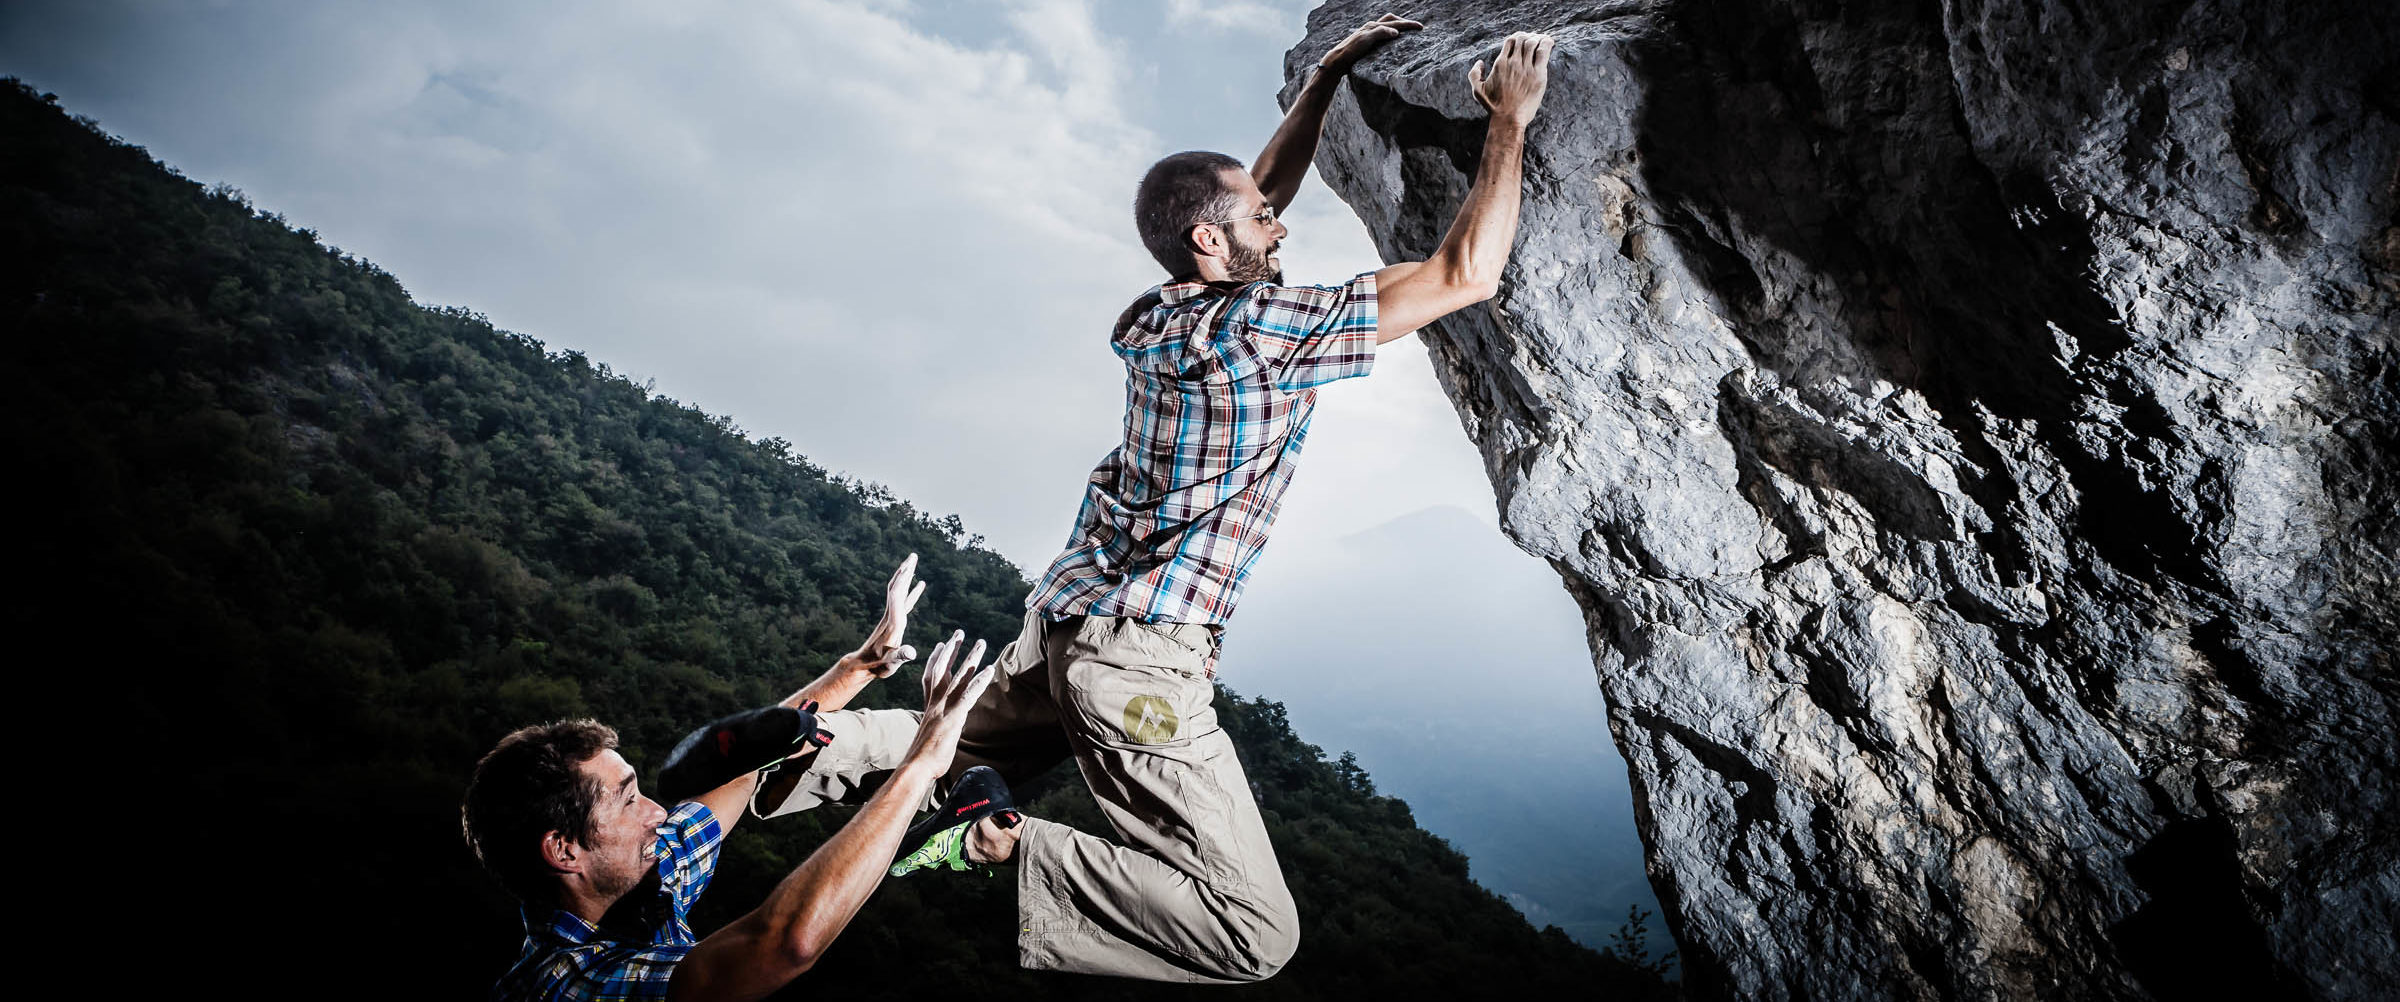 Wild climb grip climbing shoe | outdoor 2016